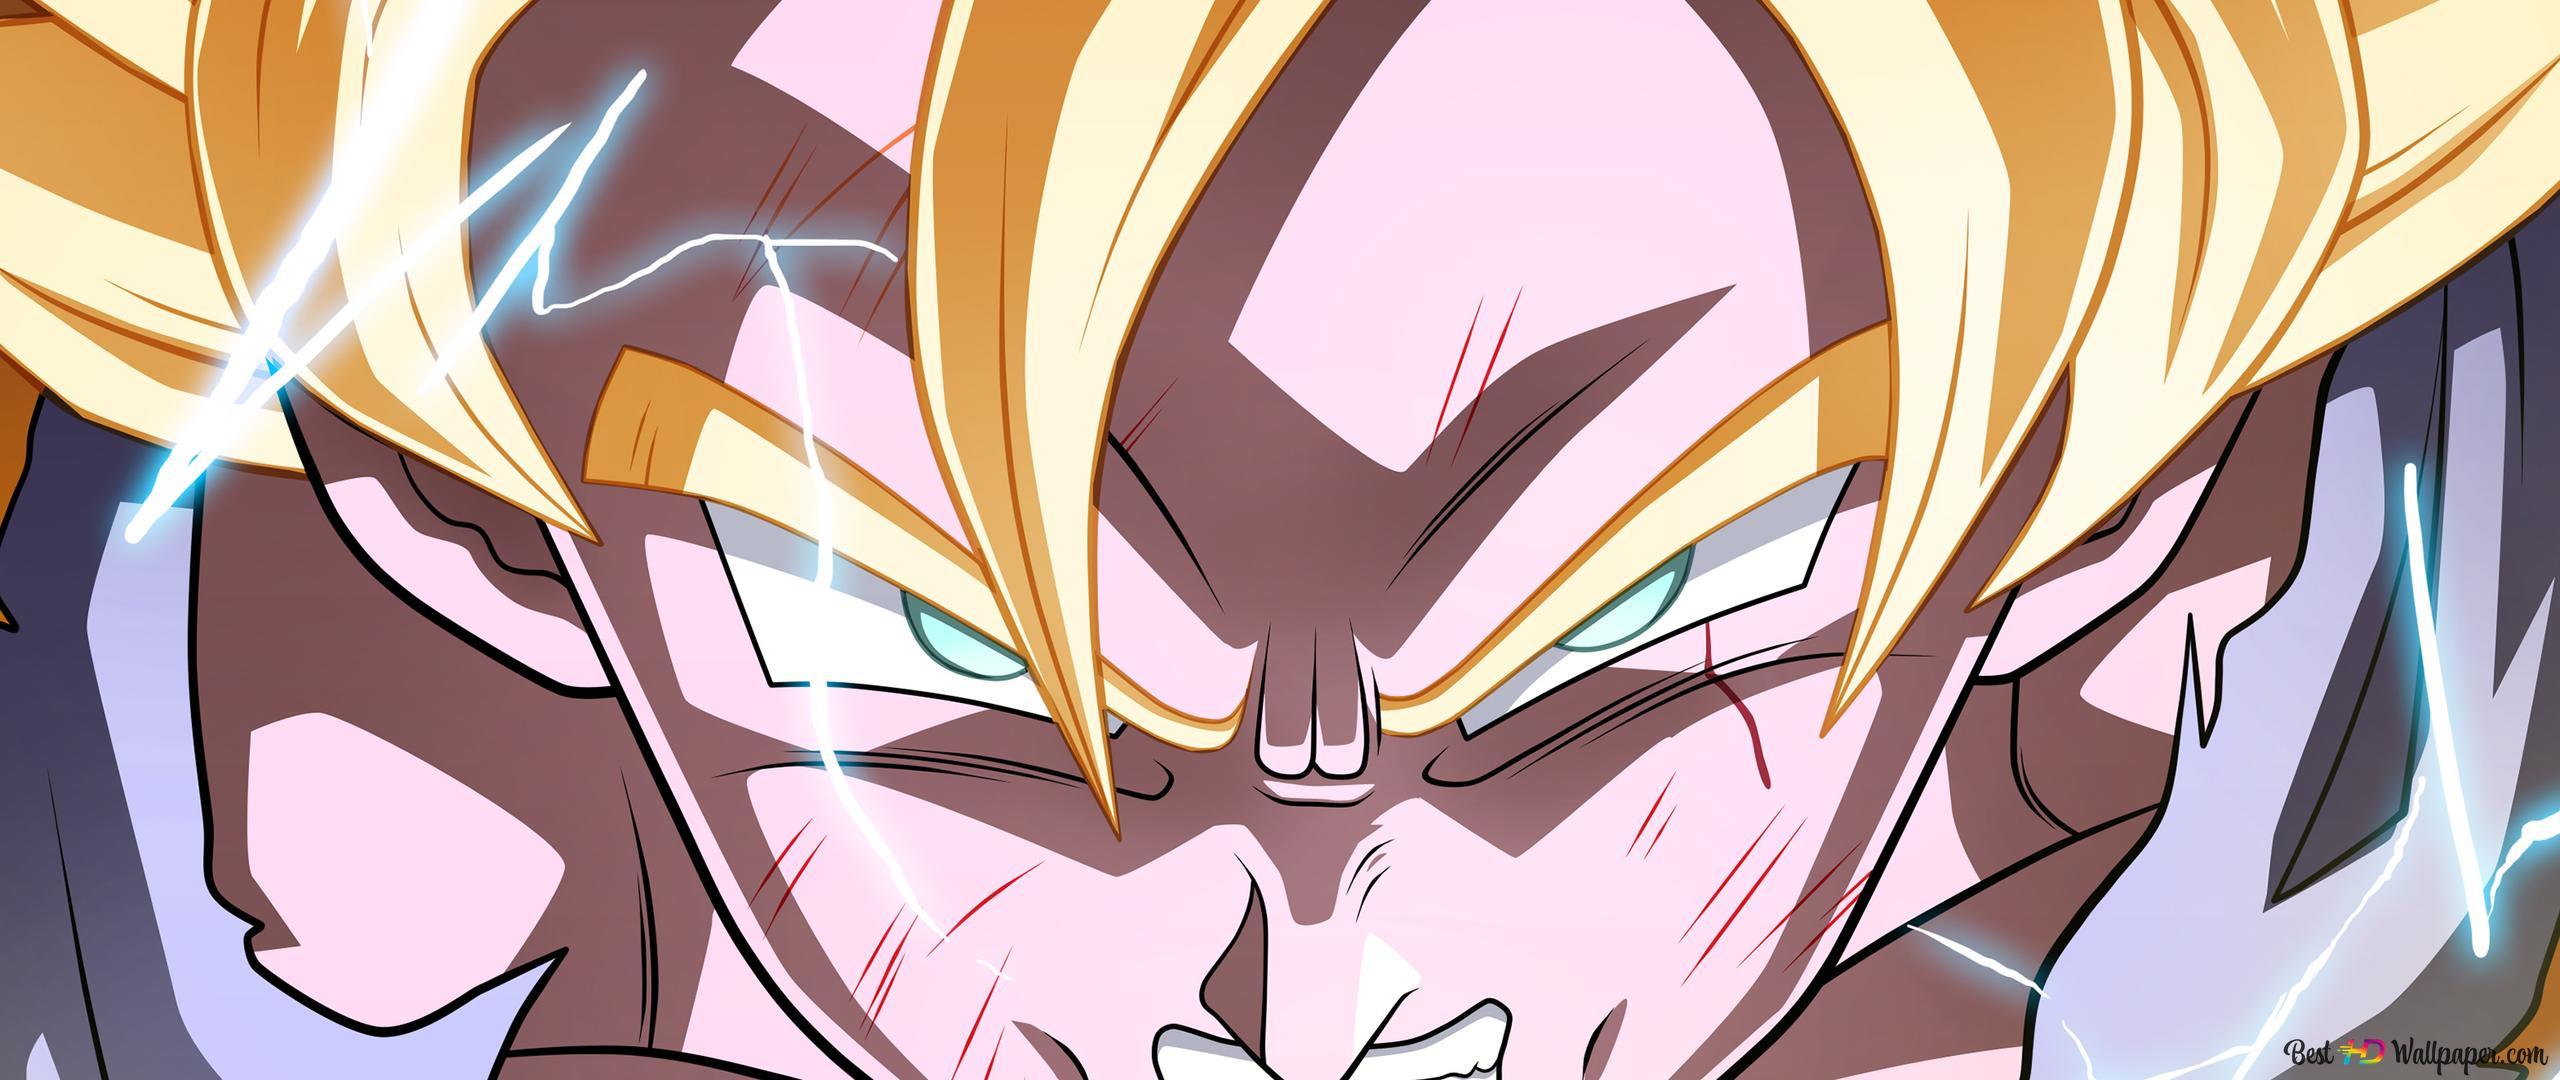 Dragon Ball Z Goku Hd Wallpaper Download